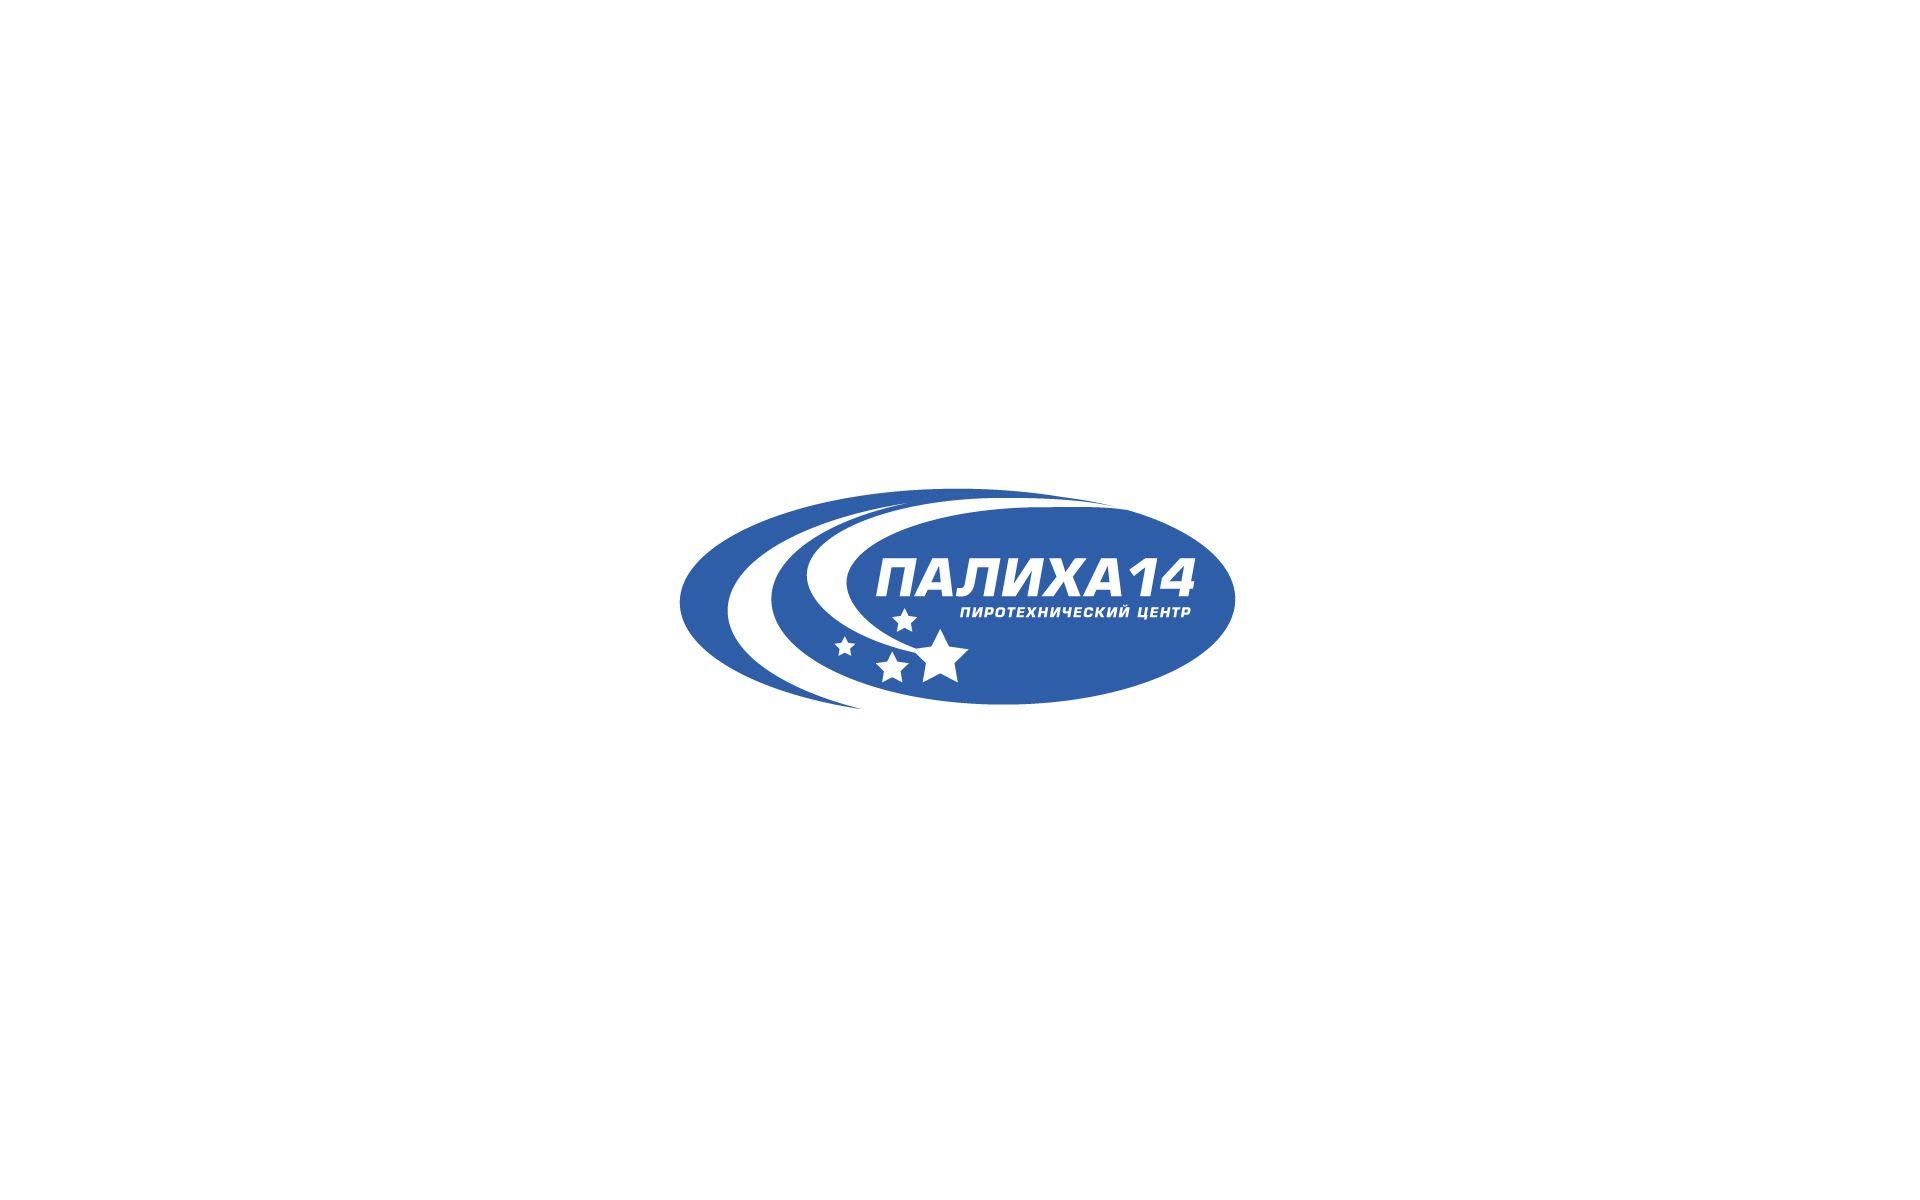 Логотип для пиротехнического центра - дизайнер U4po4mak